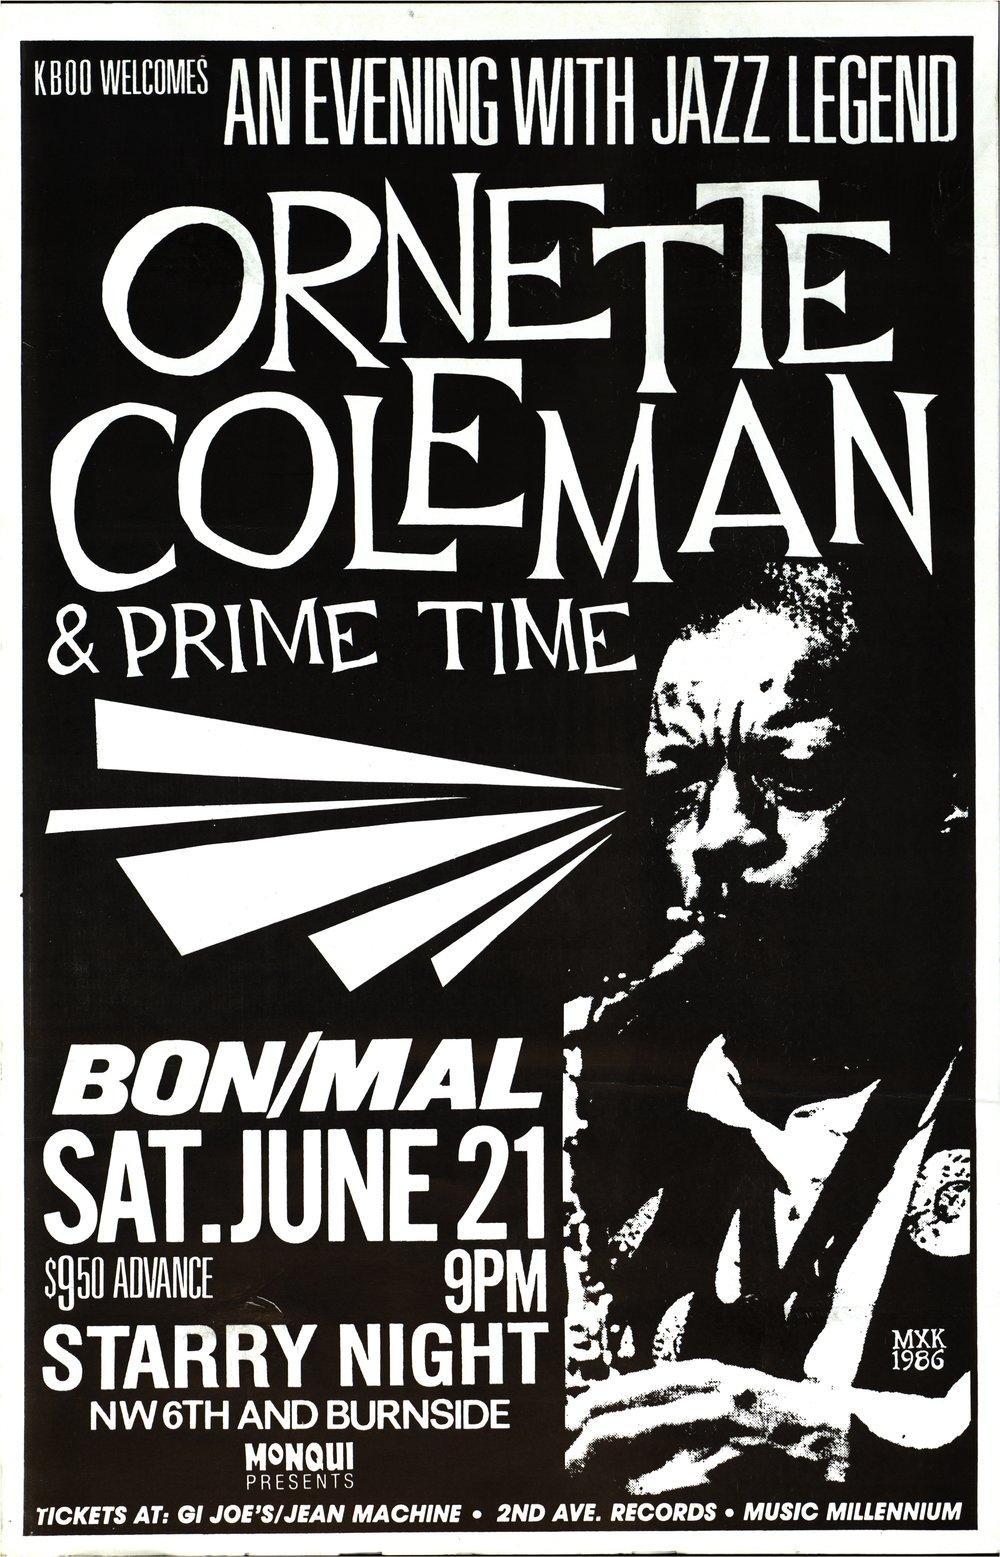 KBOO_Posters_OS_Ornette_Coleman.jpg